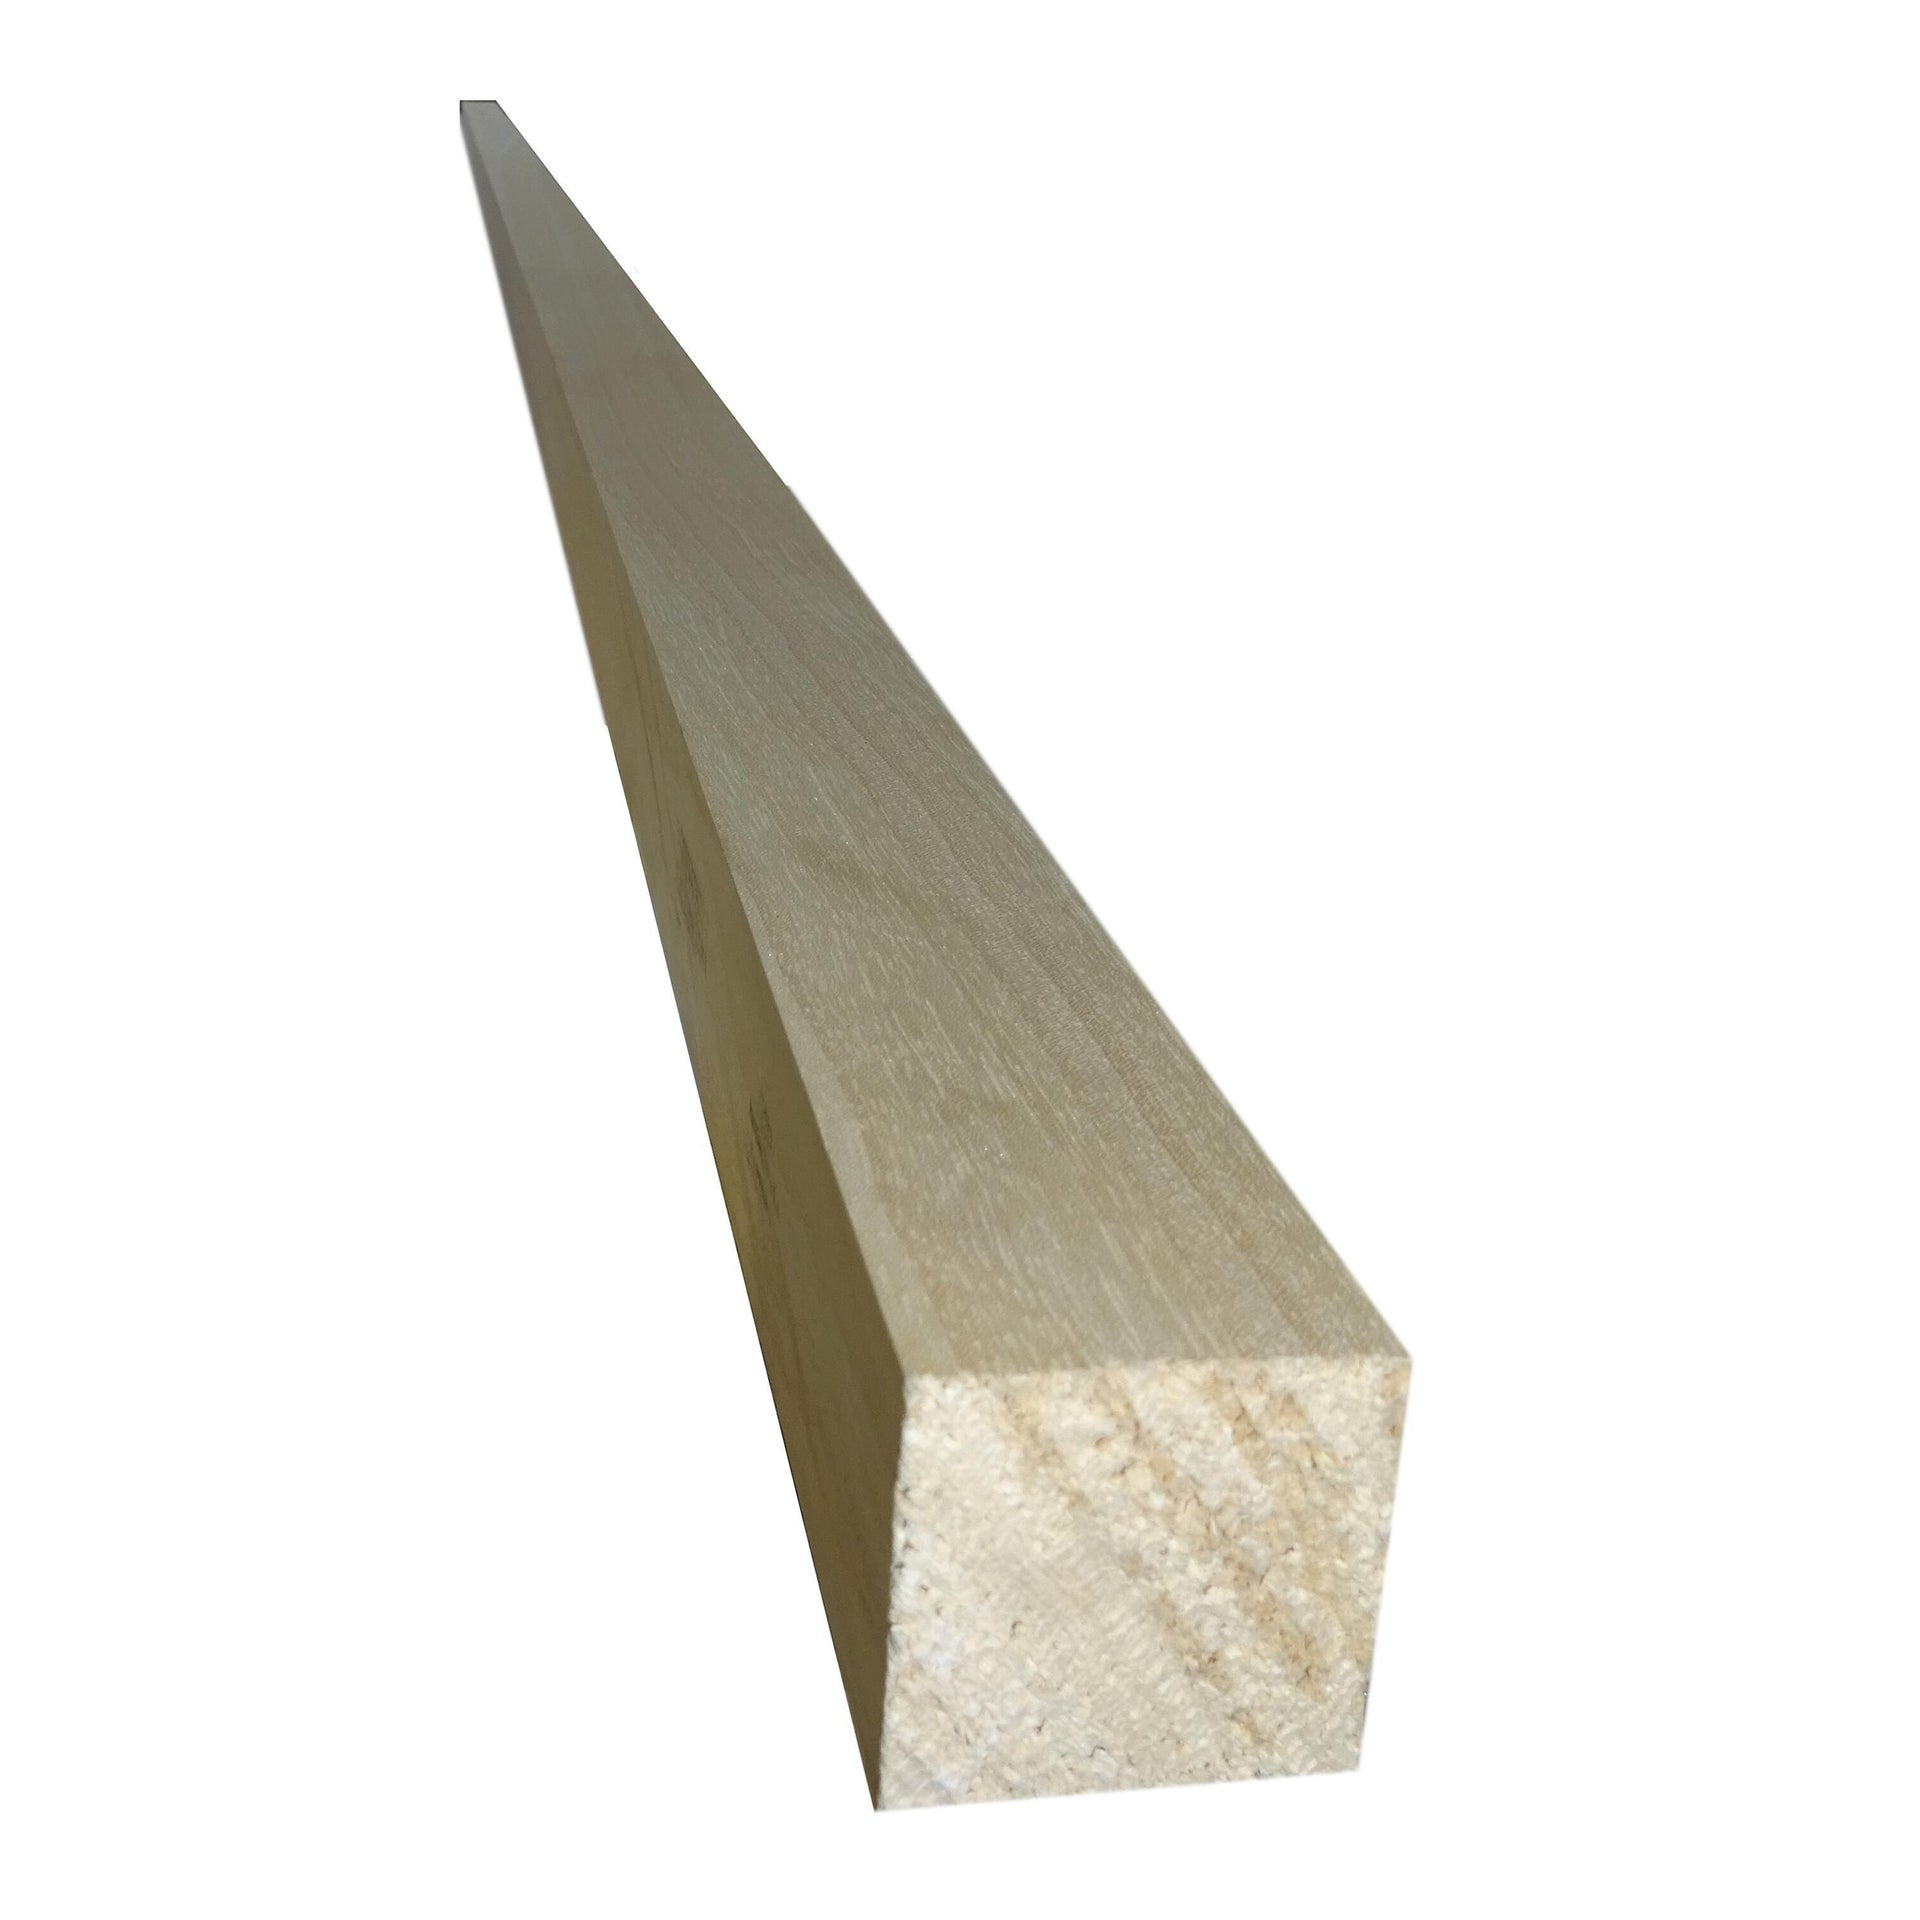 Listello piallato ayous 2.4 m x 30 mm, Sp 30 mm